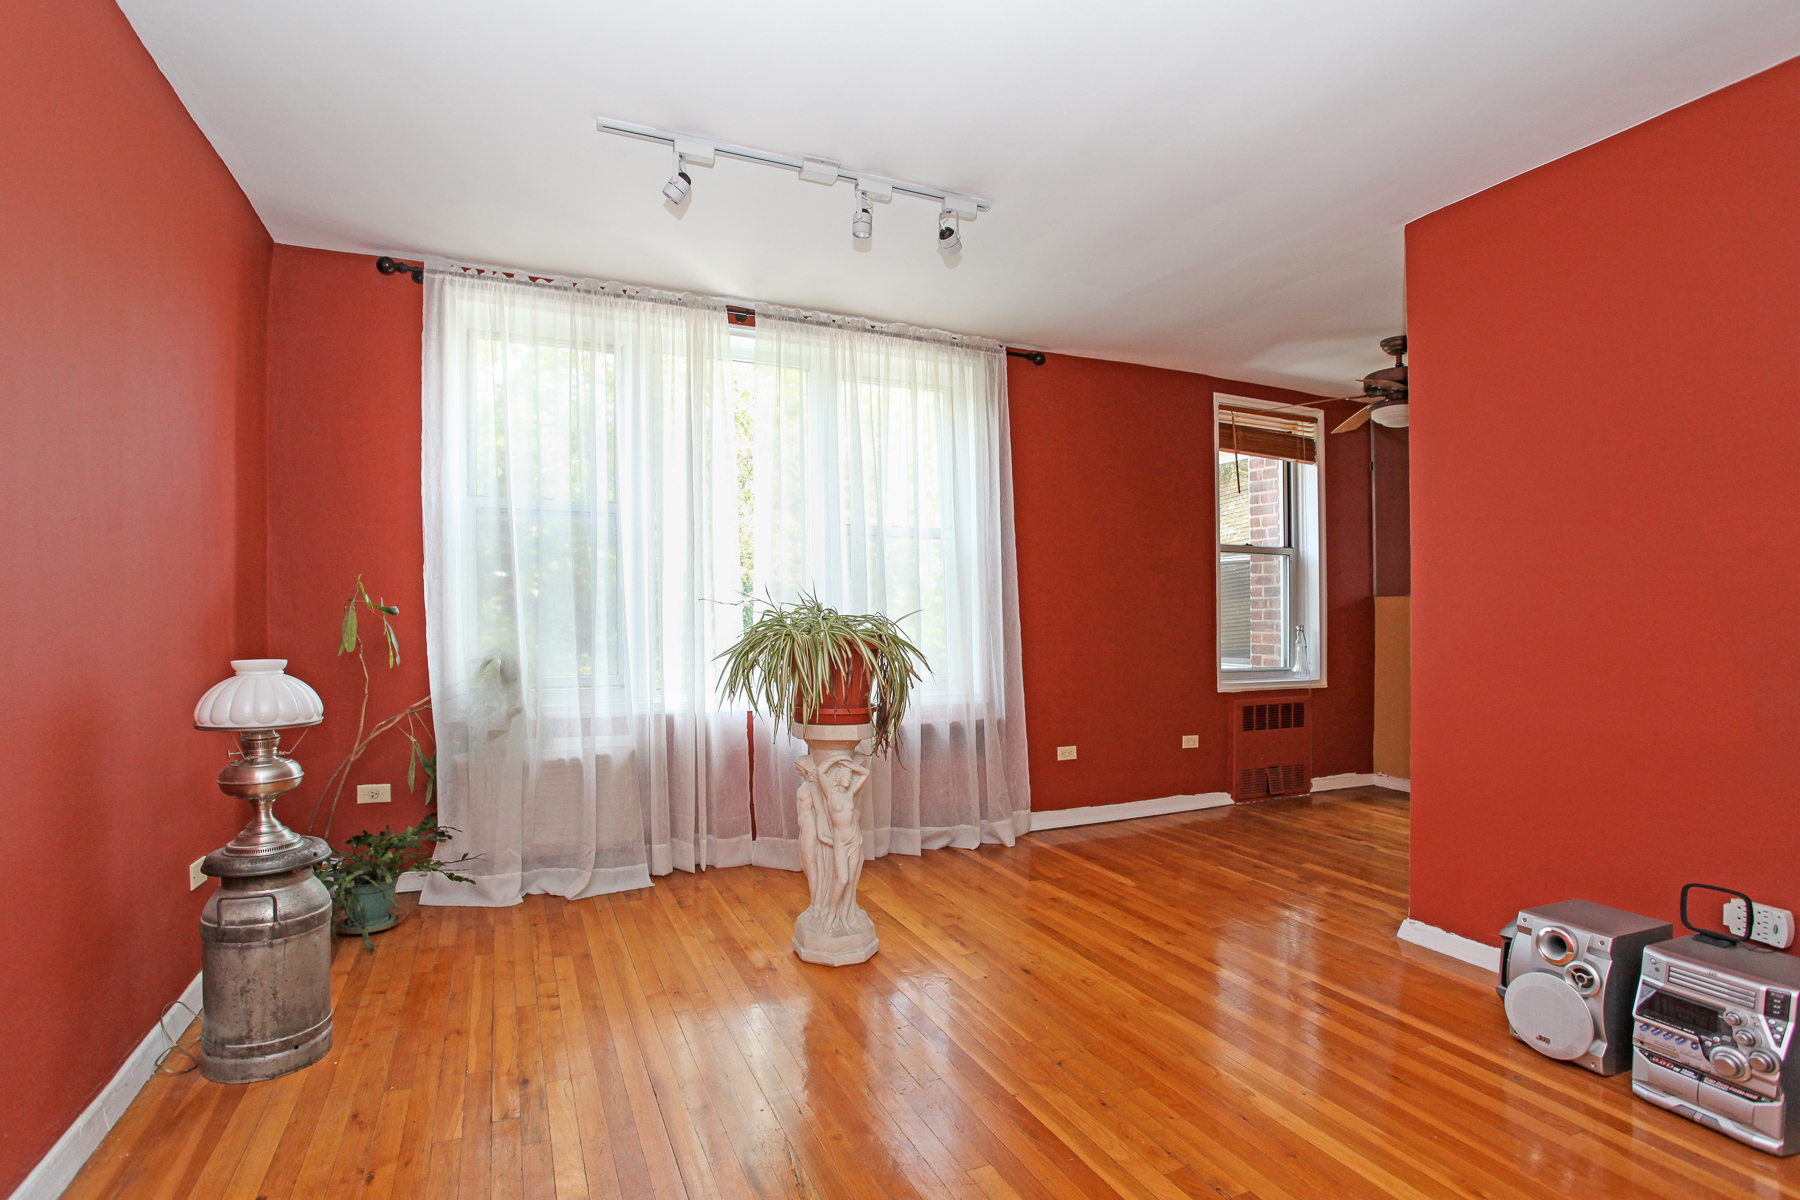 Кооперативная квартира для того Продажа на Large and Sun-filled 1 BR Co-op 6200 Riverdale Avenue 4A Riverdale, Нью-Йорк 10471 Соединенные Штаты